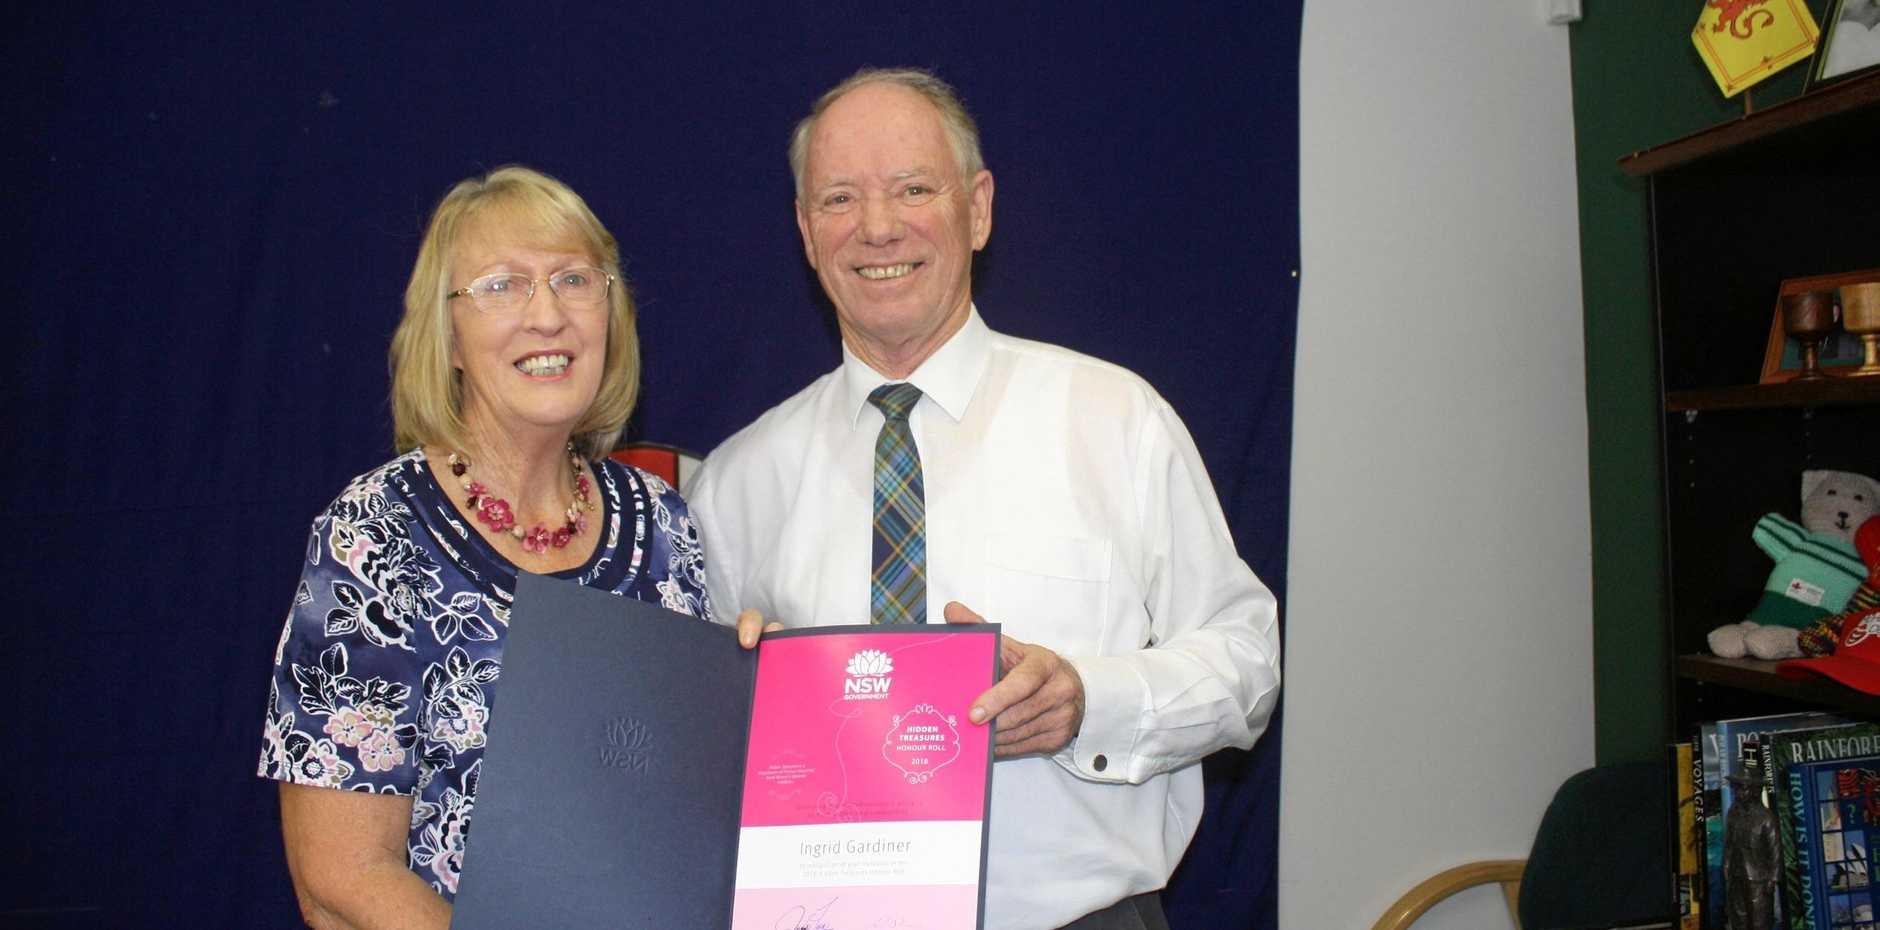 RECOGNISED: Ingrid Gardiner accepts her award from State Member for Coffs Harbour Andrew Fraser.